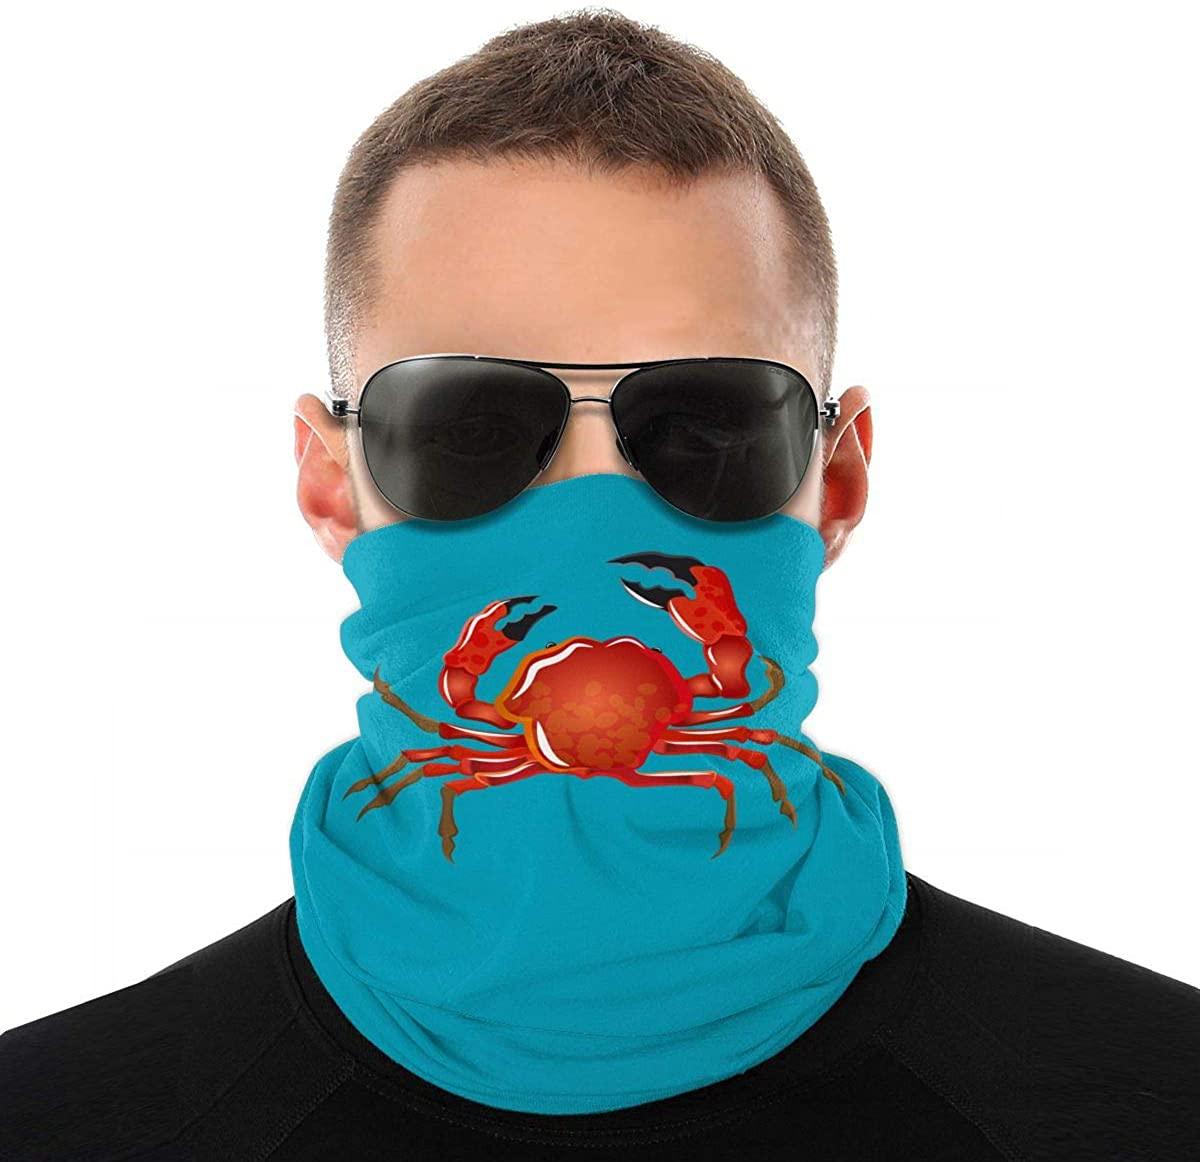 Soft-shell crab Neck Gaiter Unisex adult Windproof Mask Dust Sports novelty Face Mask Half Balaclava Weather bandana women men Outdoors Festivals